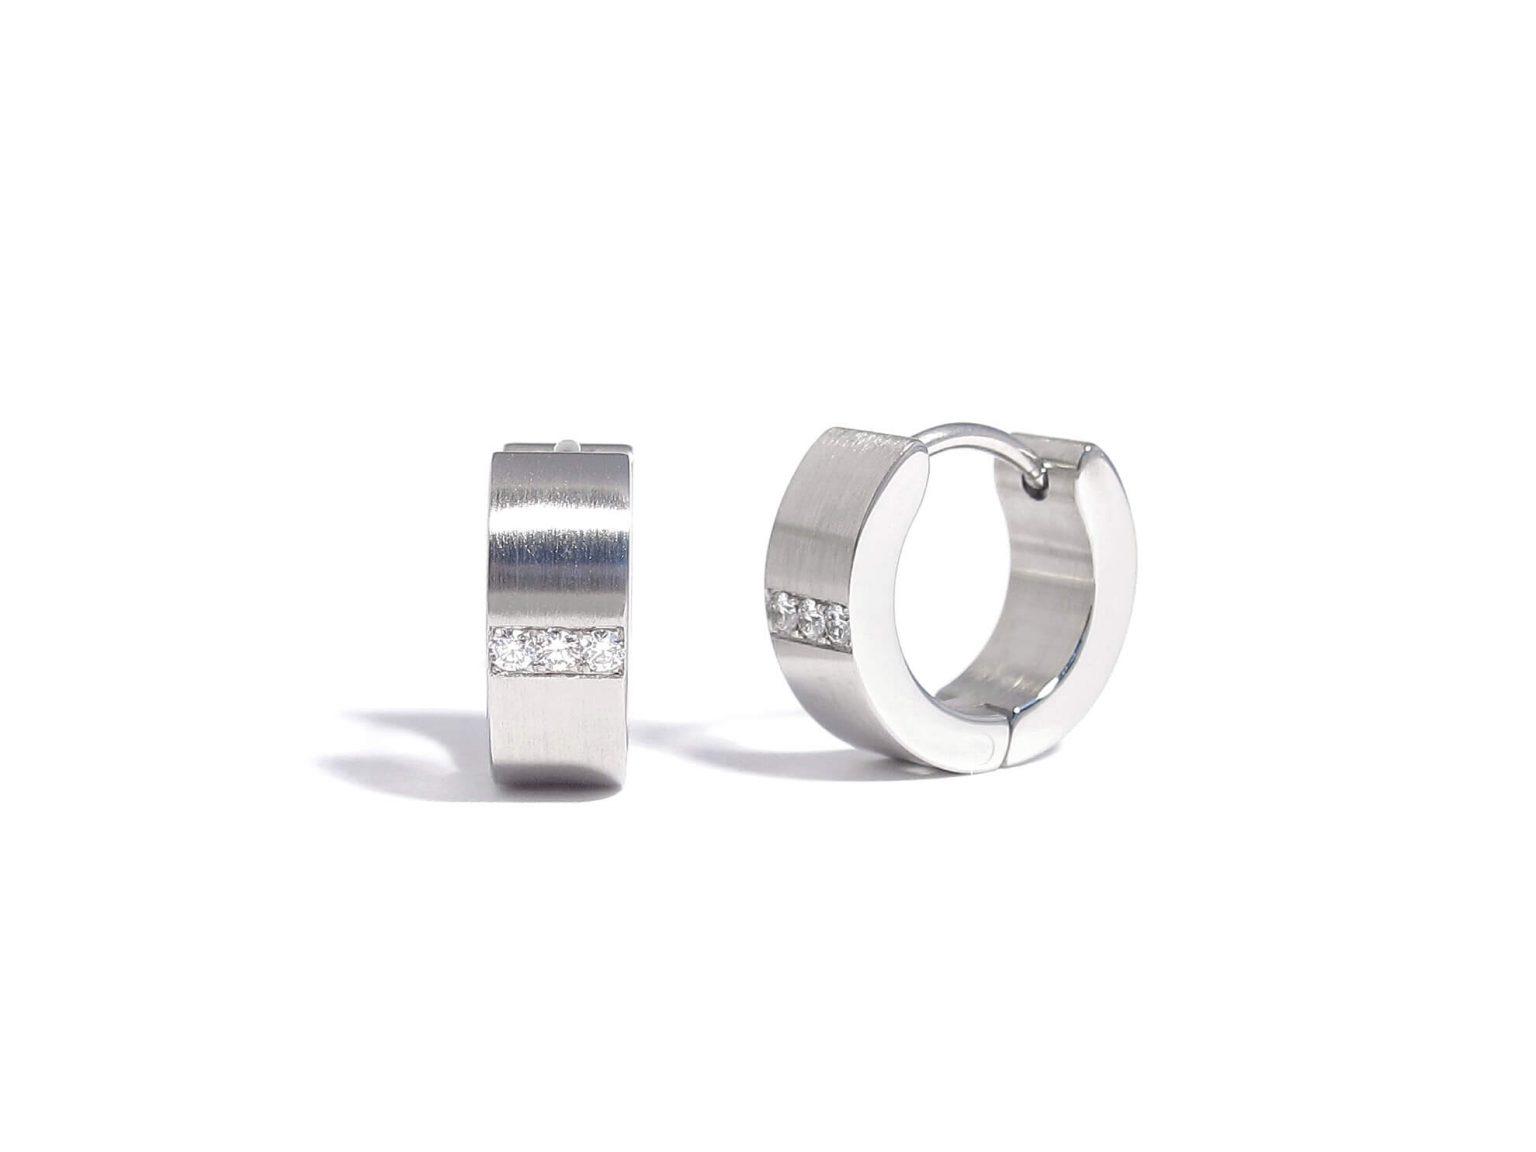 diamond and steel steel creole earrings